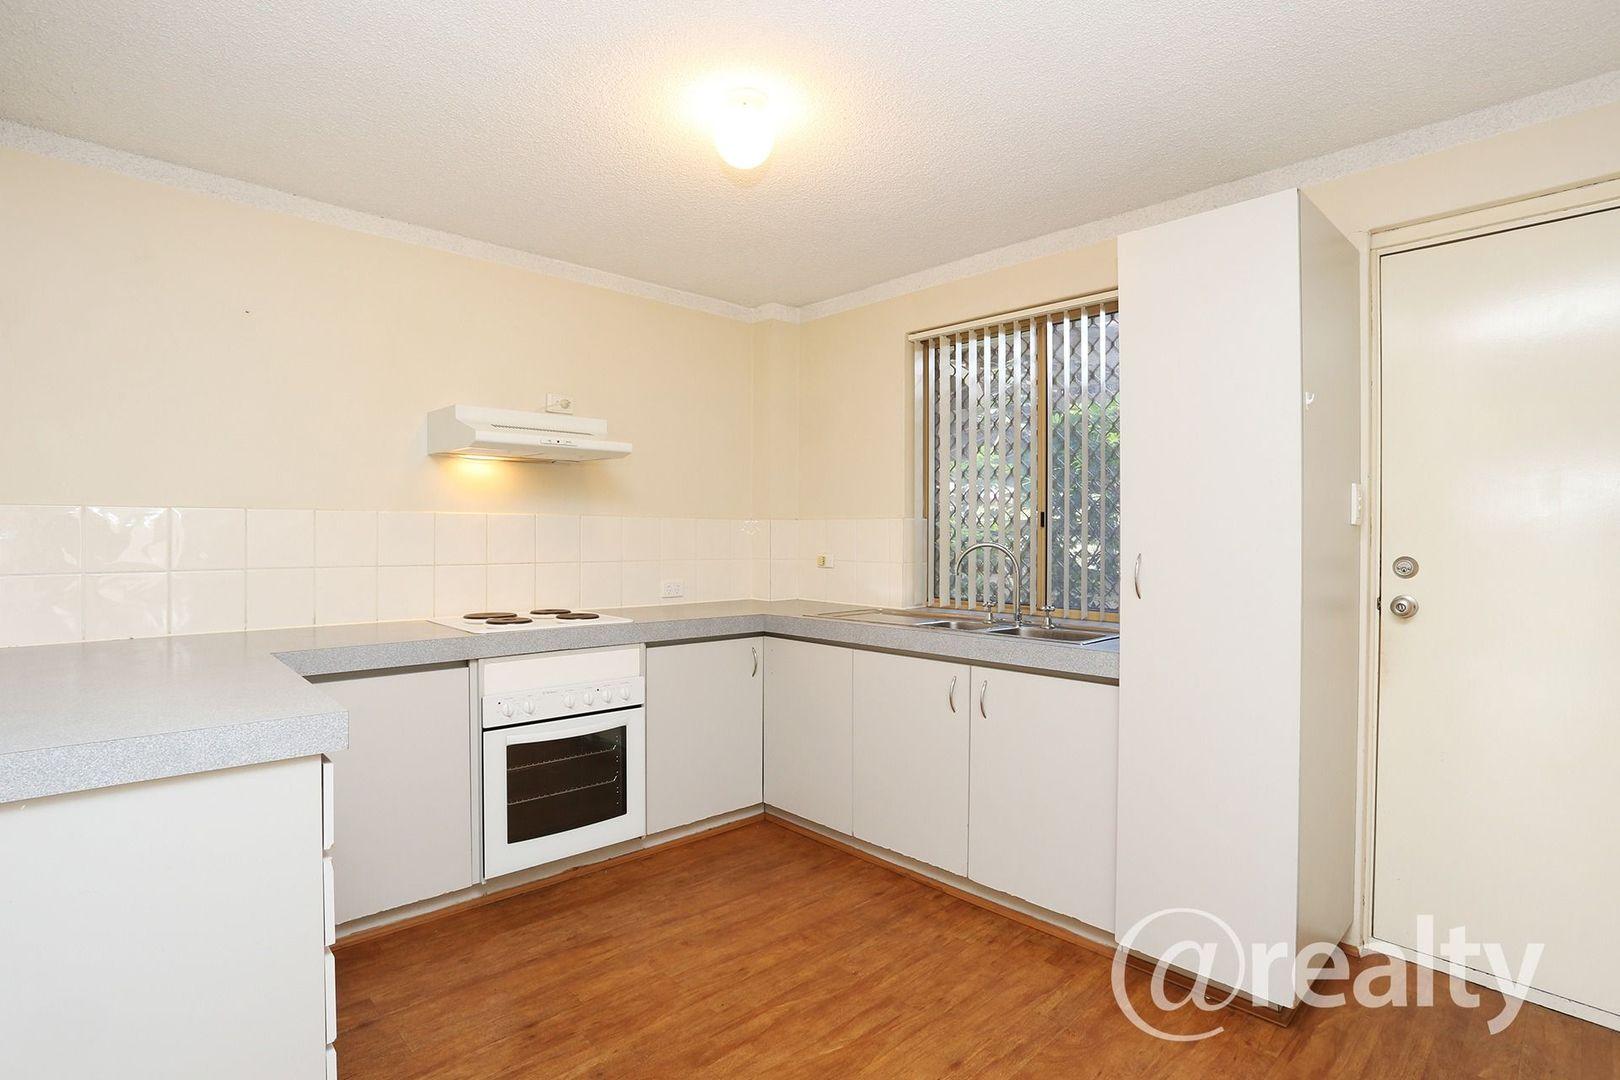 5/34 Carr Street, West Perth WA 6005, Image 0